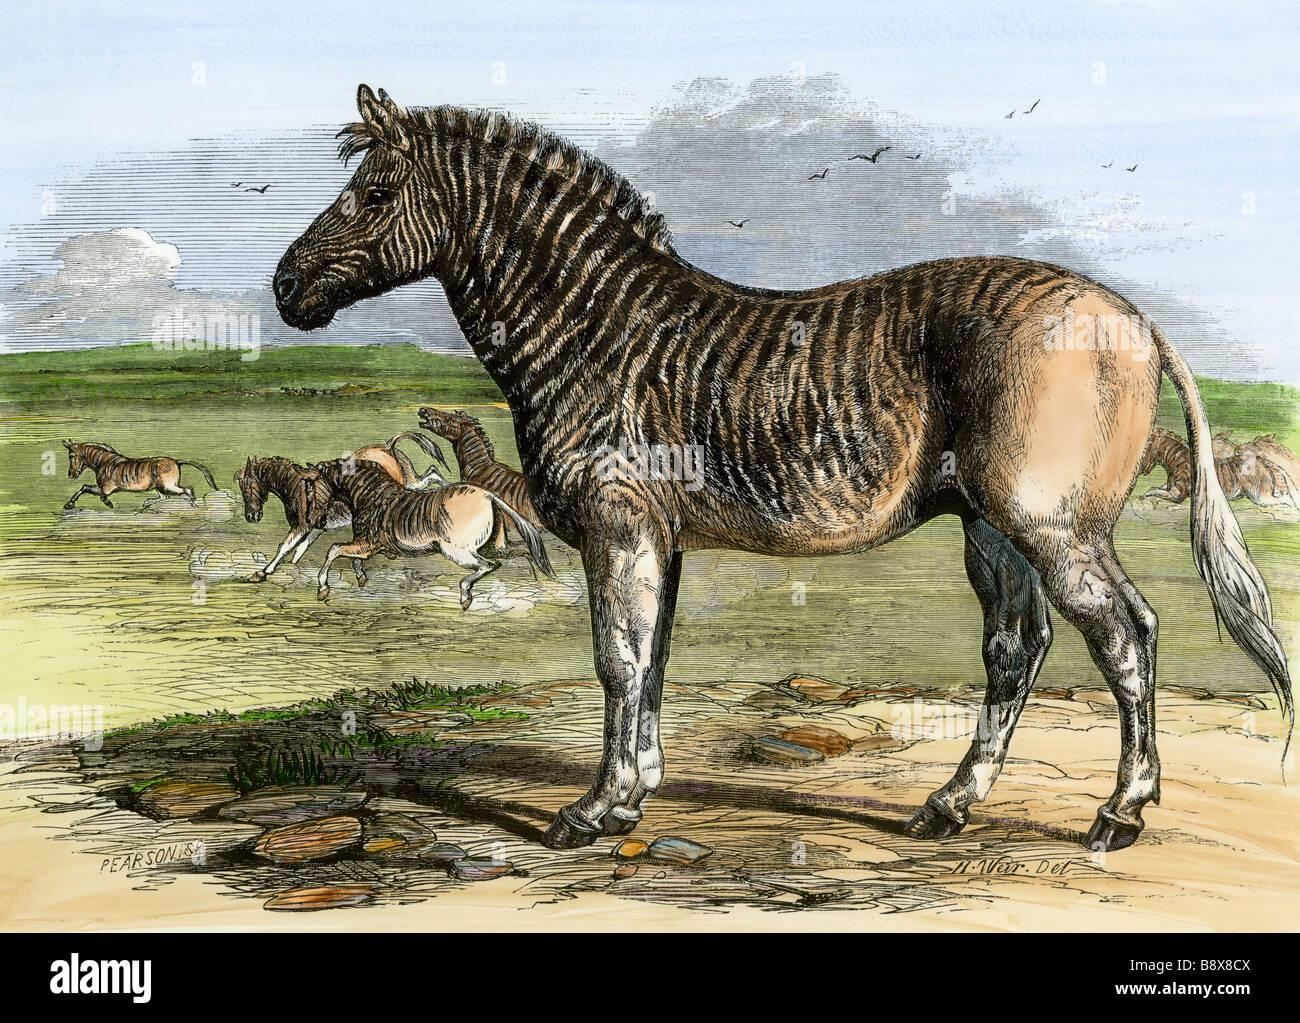 Quagga africaine, aujourd'hui disparu, au Zoo de Londres 1850 Photo Stock